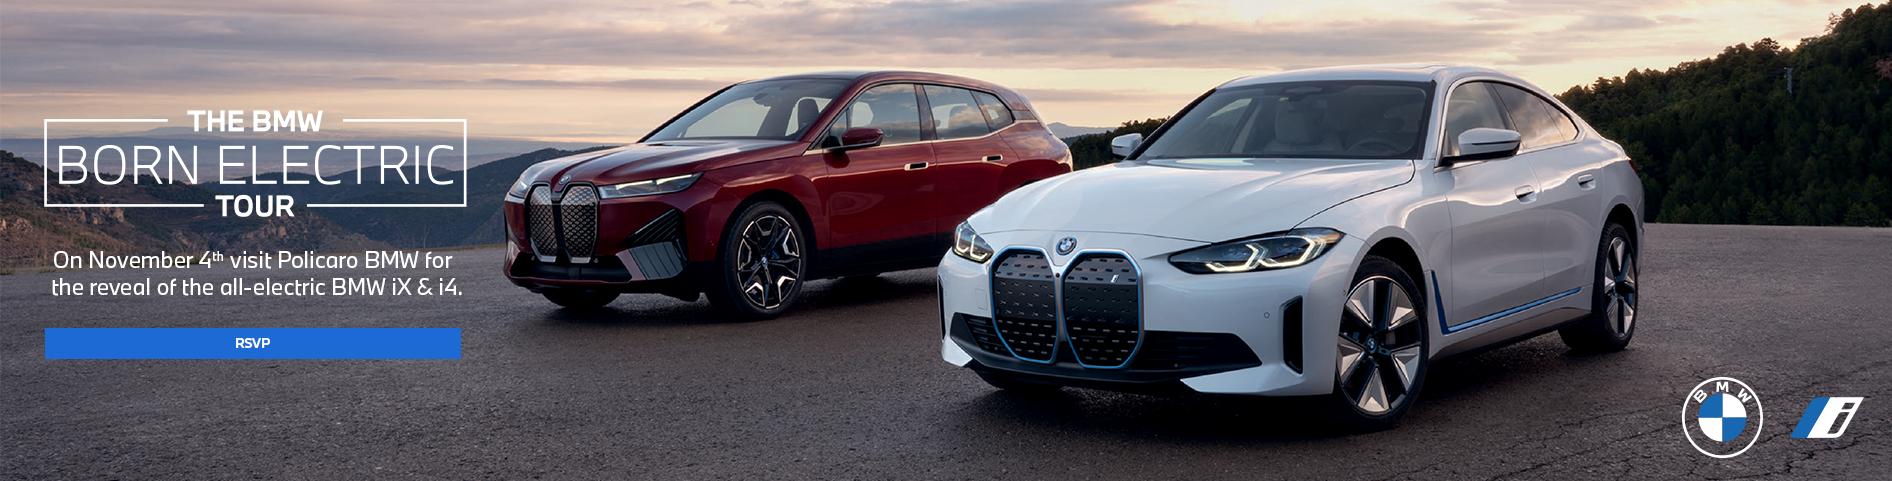 BMW-born-electric-tour-webbanner